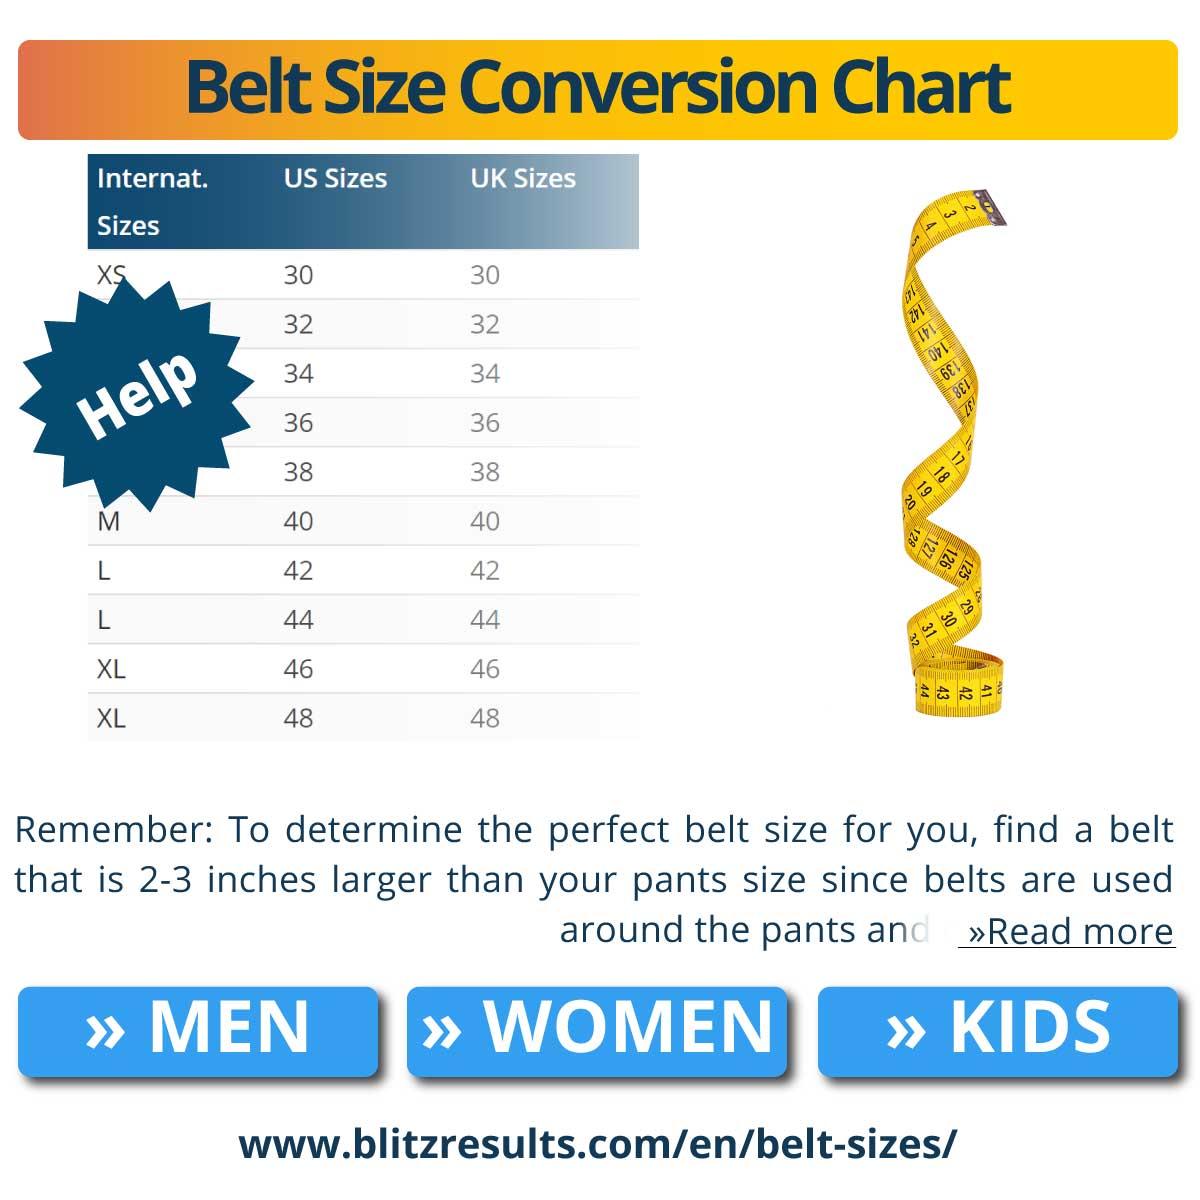 Belt Size Conversion Chart